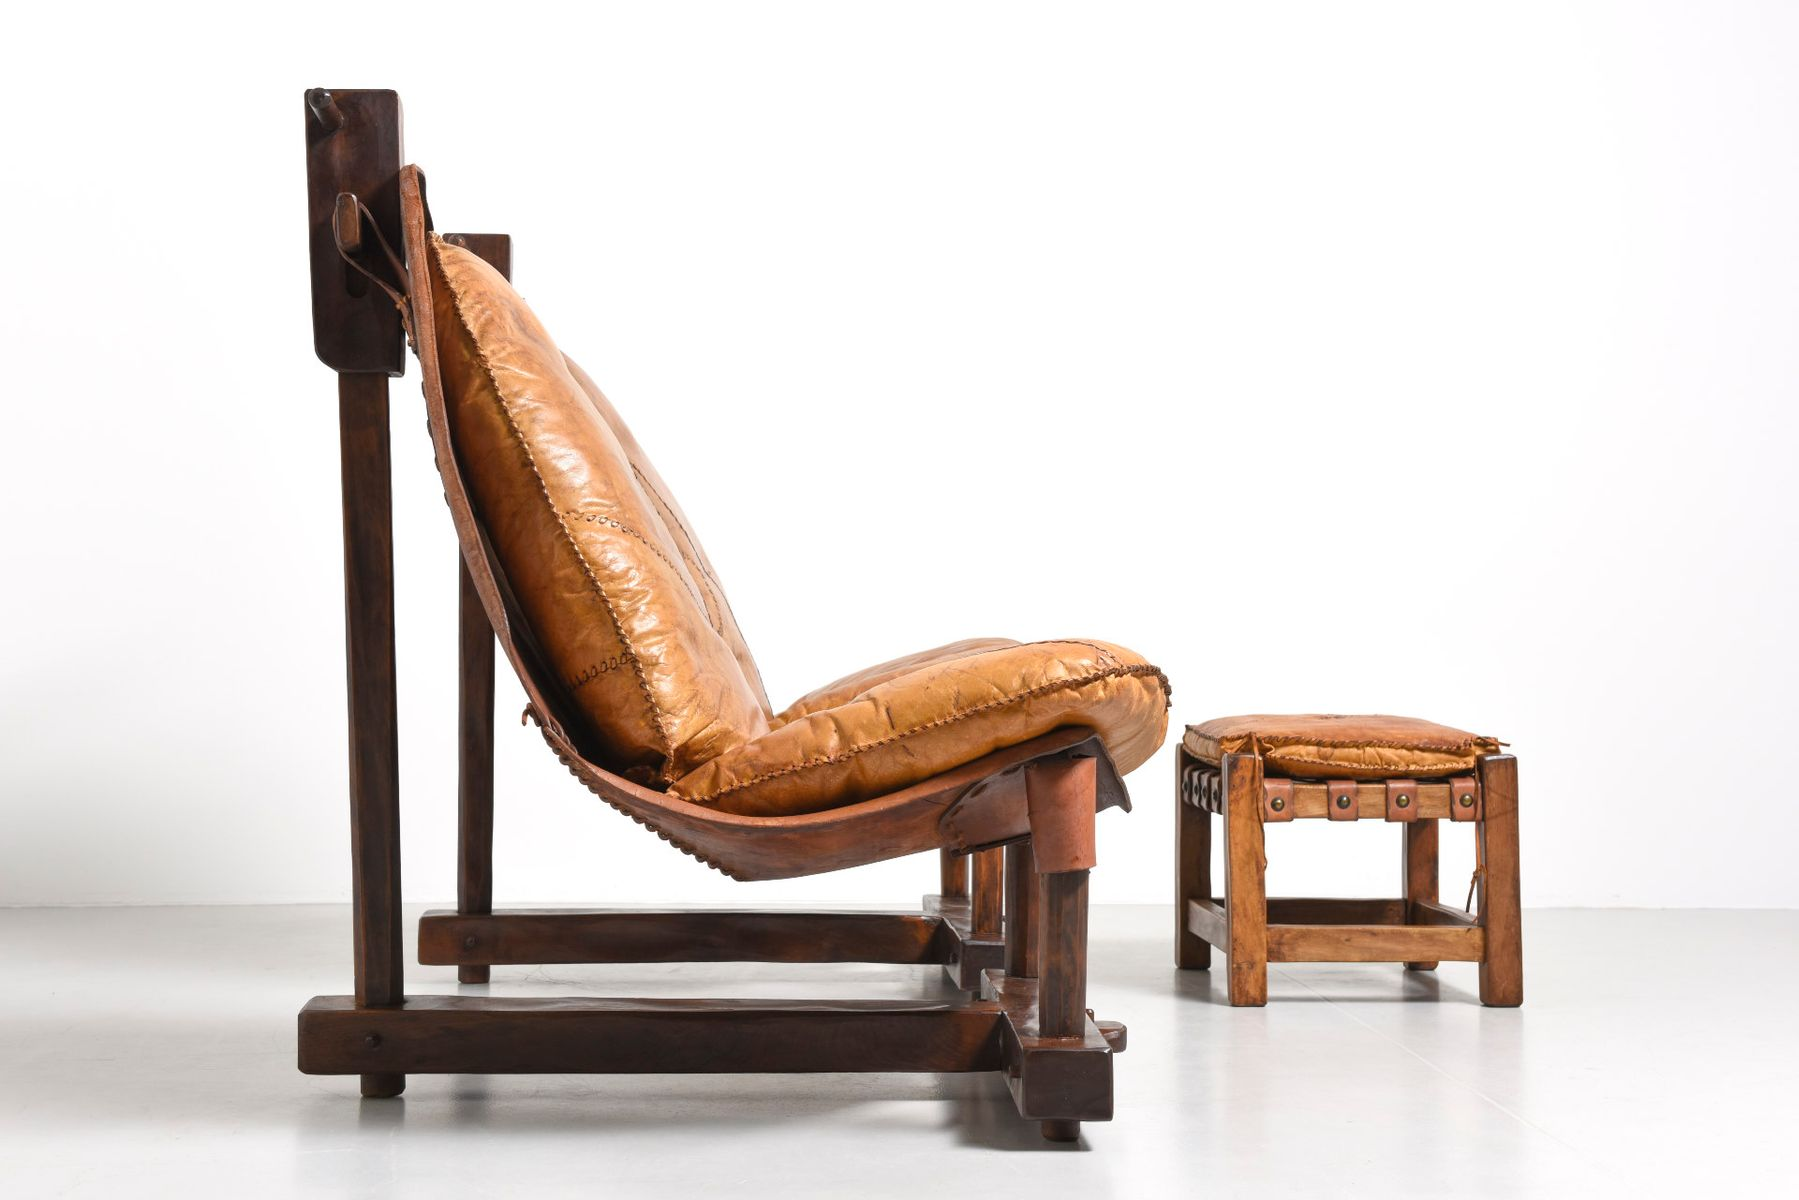 Vintage sessel ottomane im brasilianischen stil bei for Vintage sessel berlin